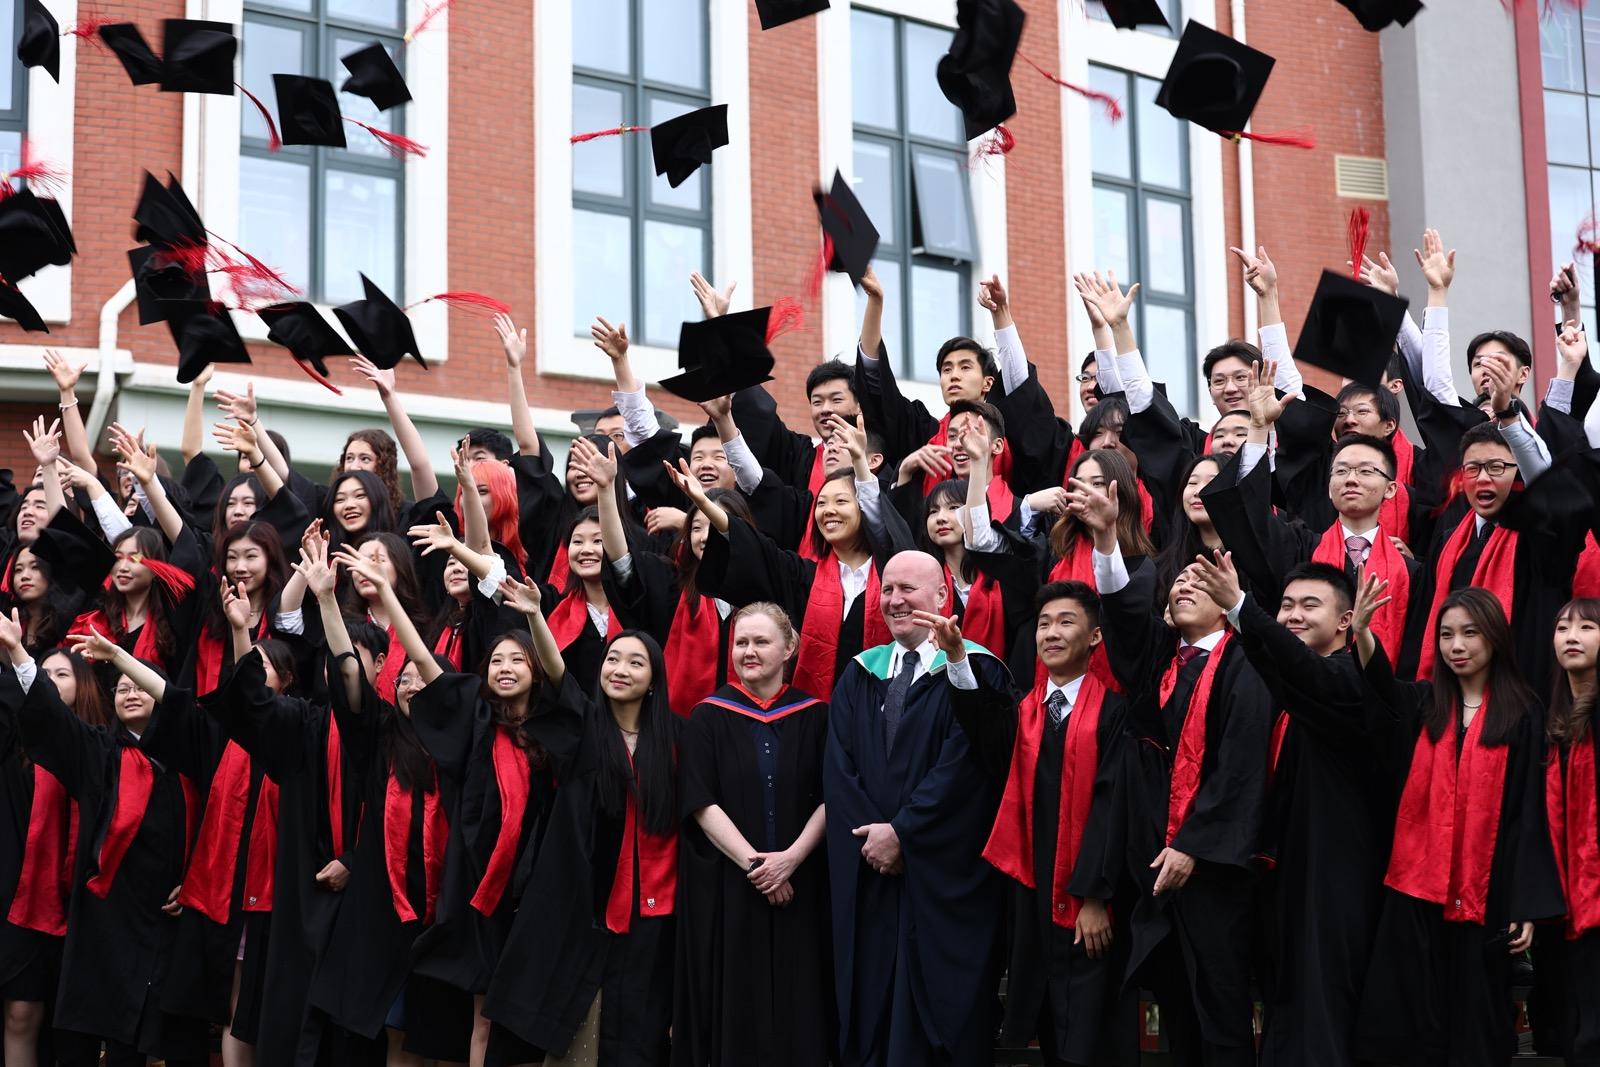 DCB graduation photo - hat throwing